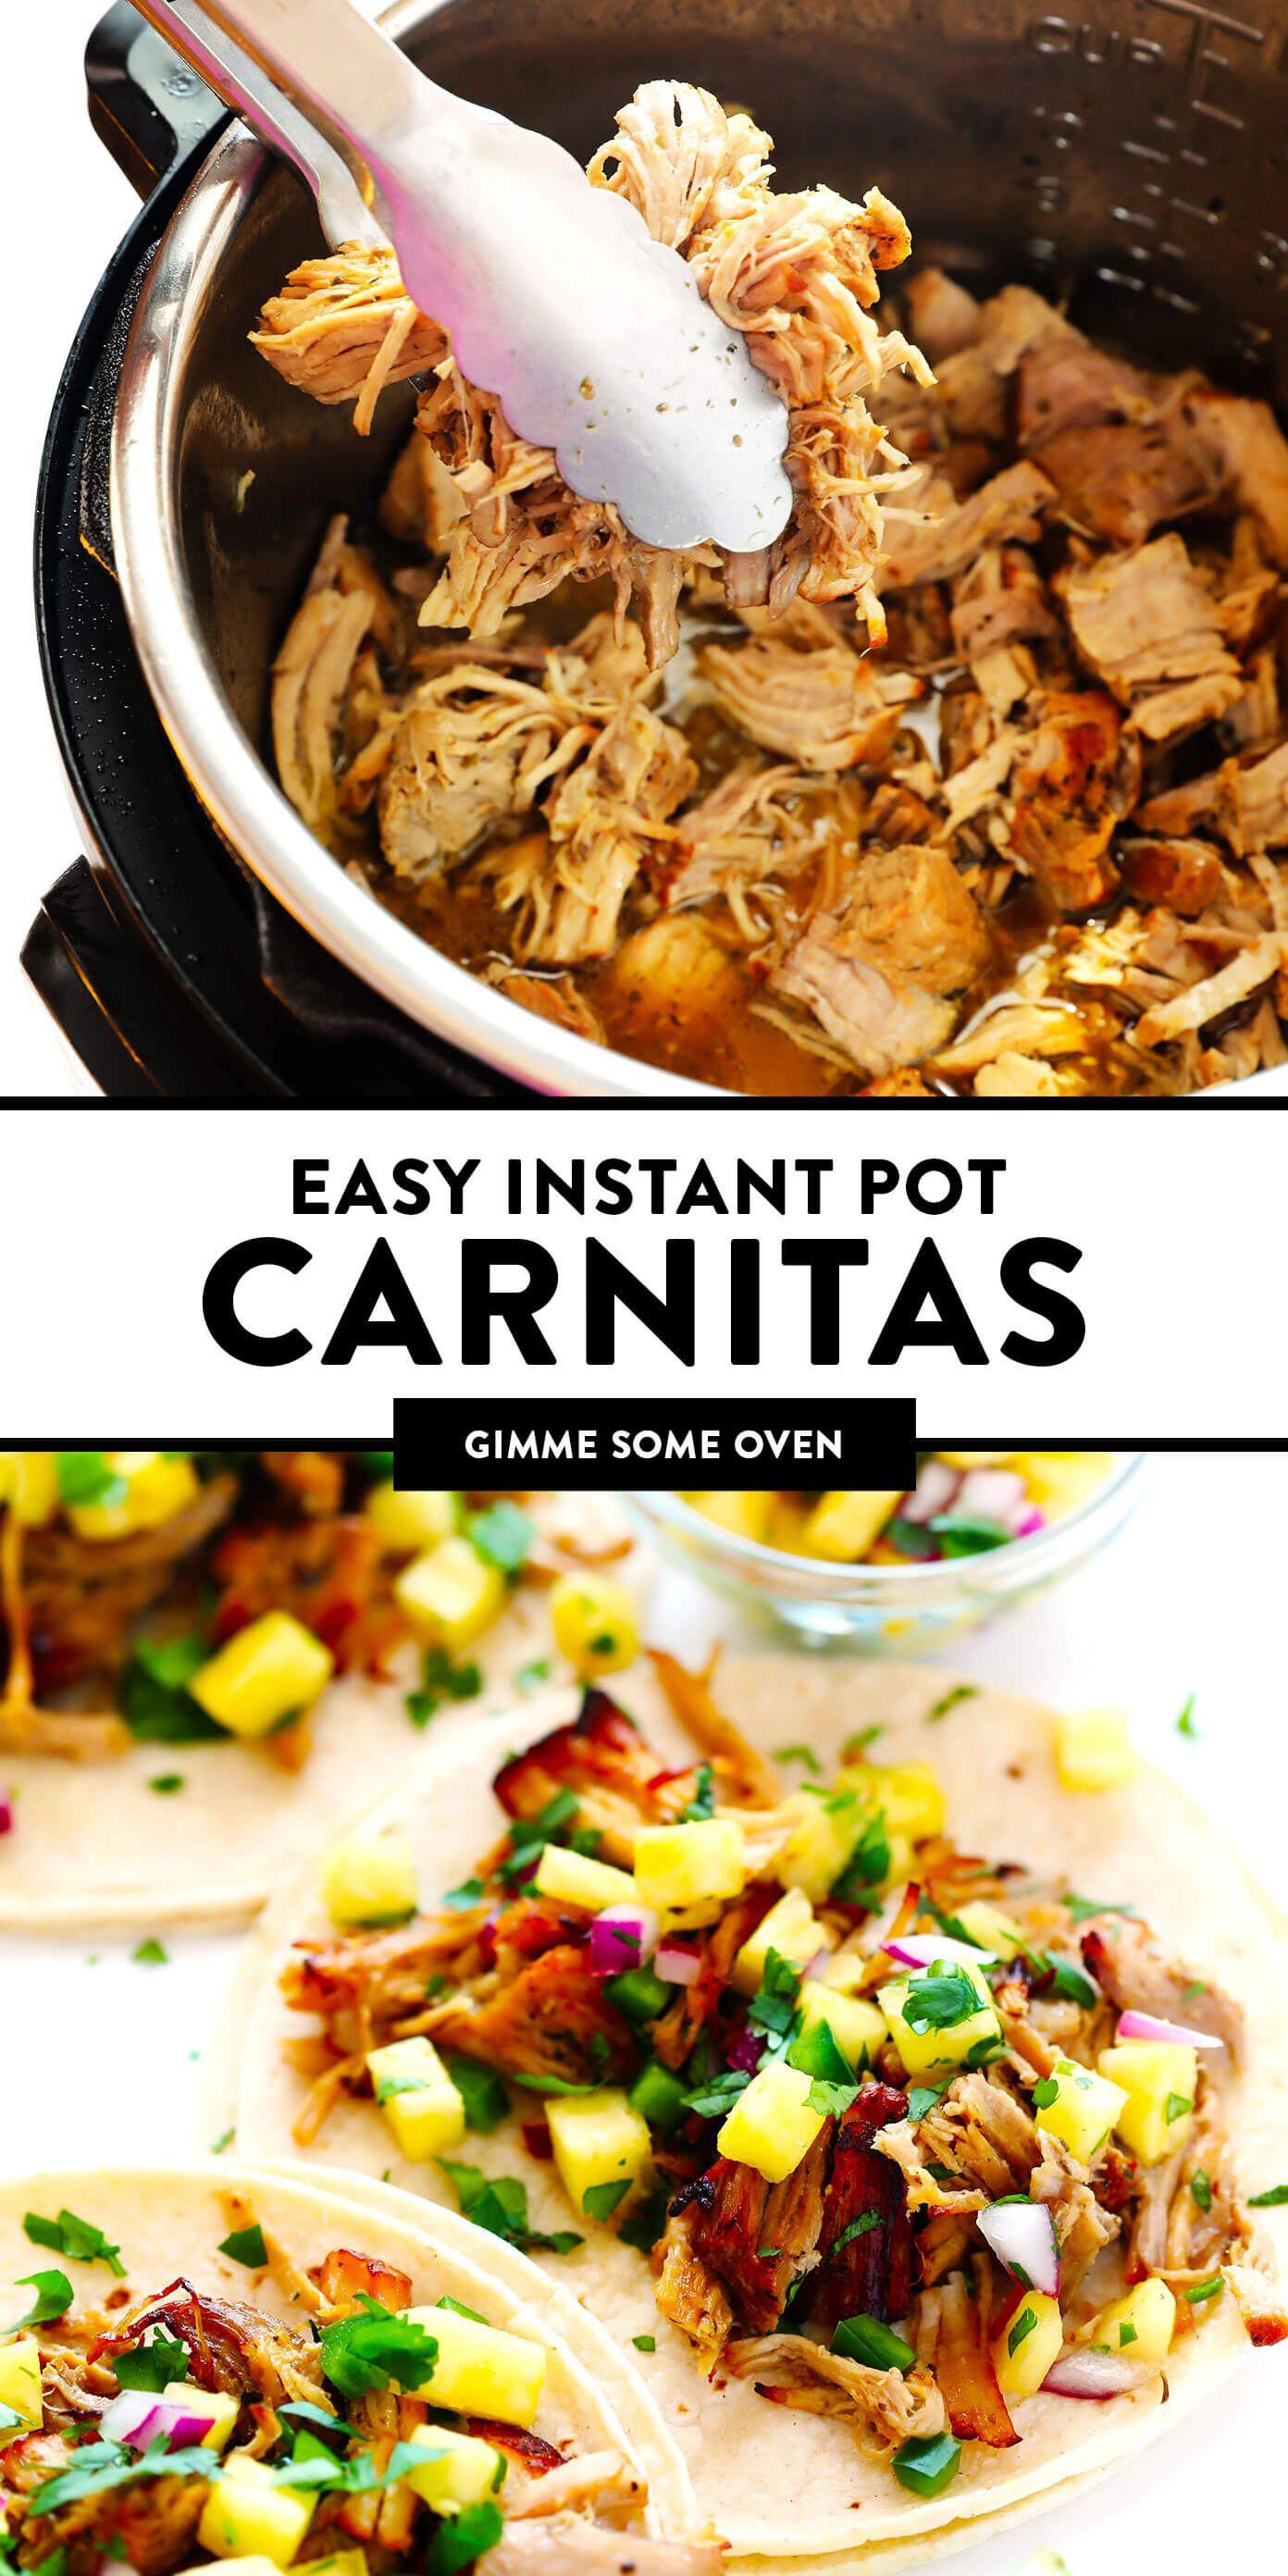 Instant Pot Crispy Carnitas Gimme Some Oven Recipe Instant Pot Dinner Recipes Instant Pot Carnitas Recipe Carnitas Recipe